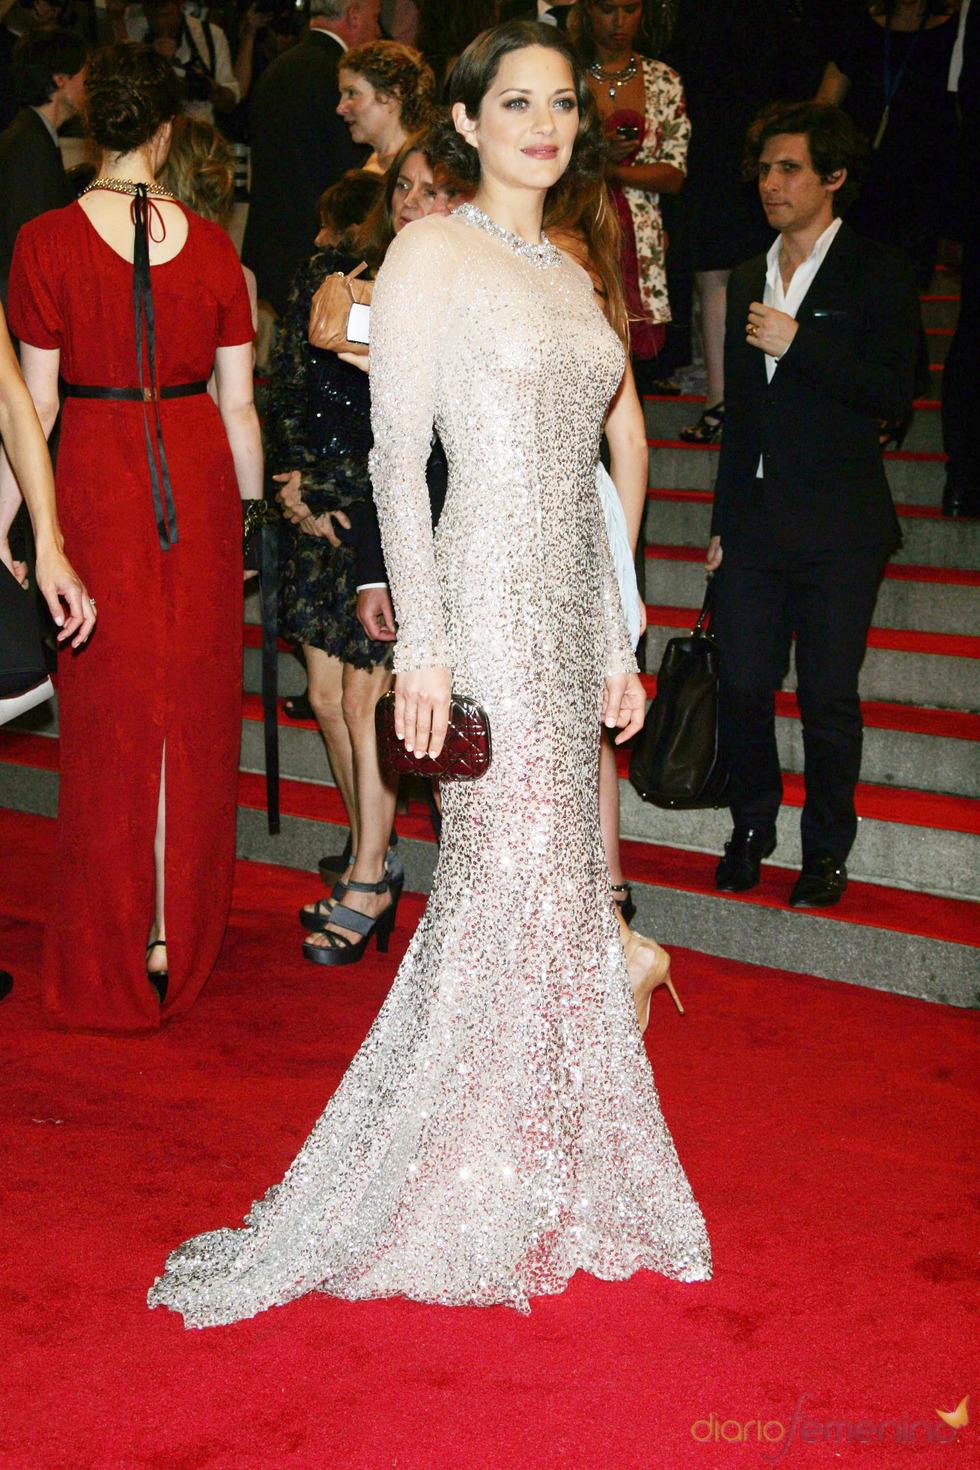 Marion Cotillard en la gala del Costume Institute